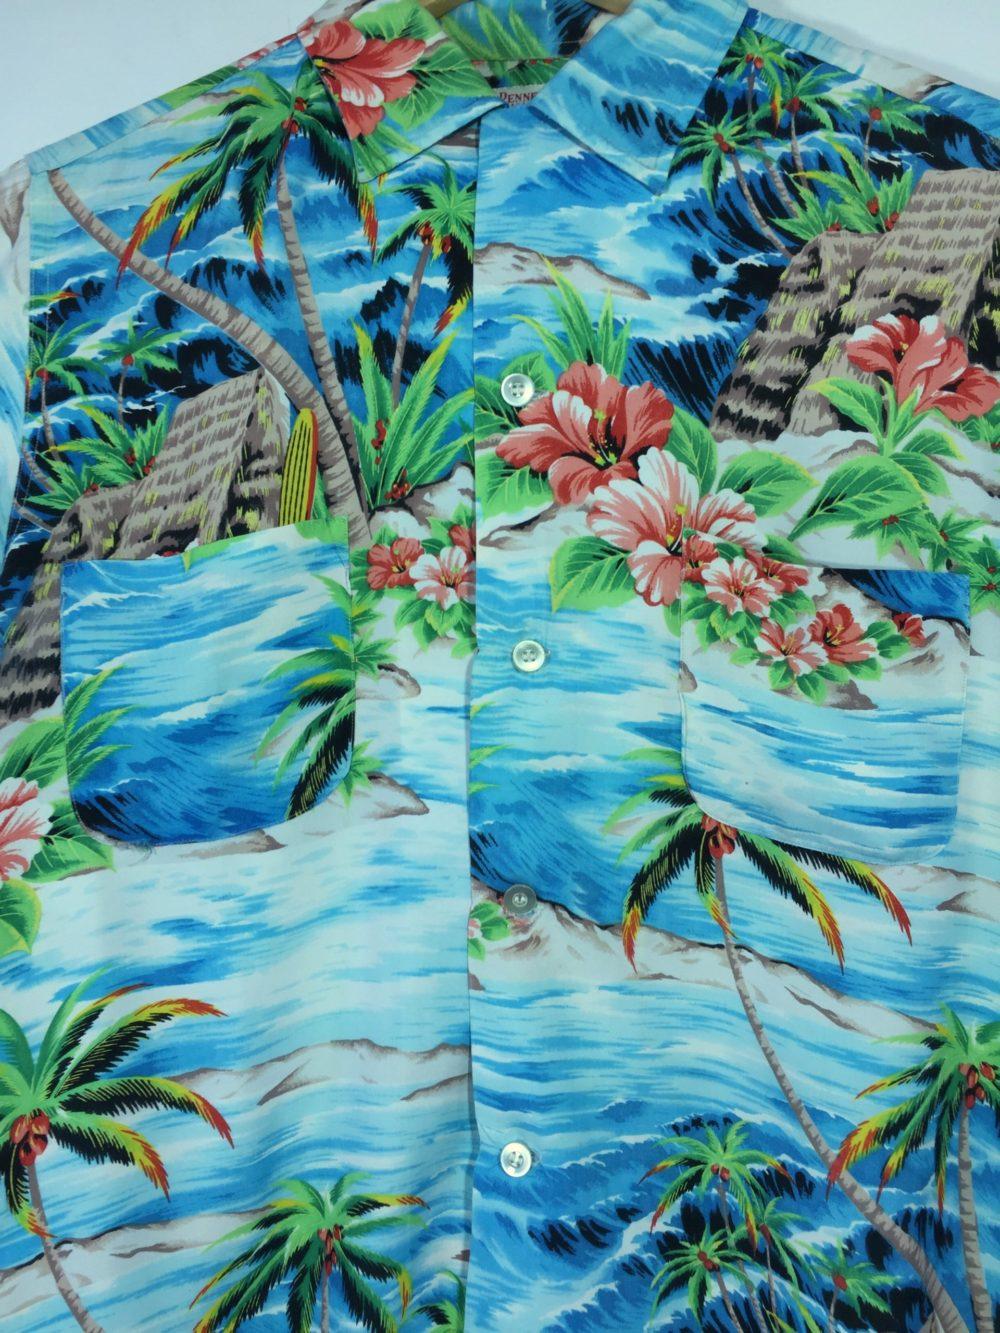 PENNY'S Vintage Aloha Shirts